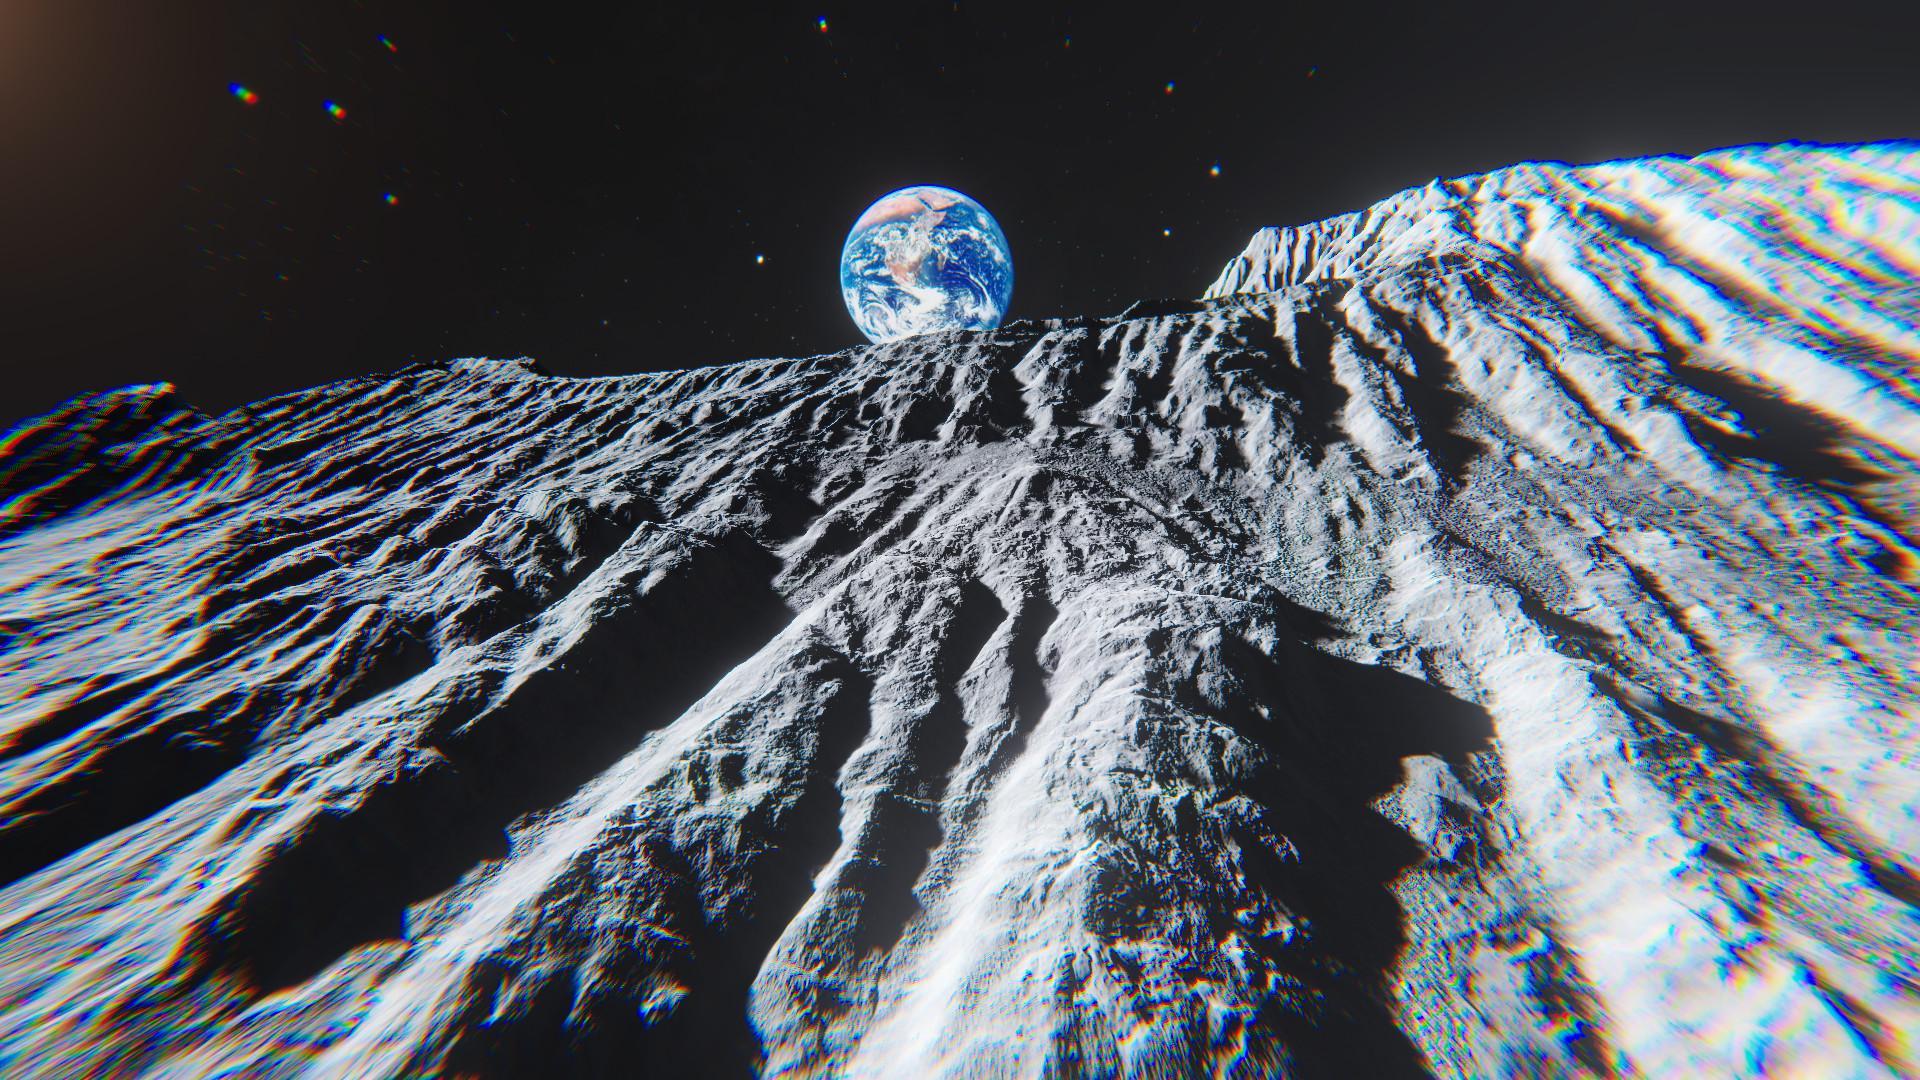 ArtStation - [Unity] - Moon terrain pack, Sergey Kuydin